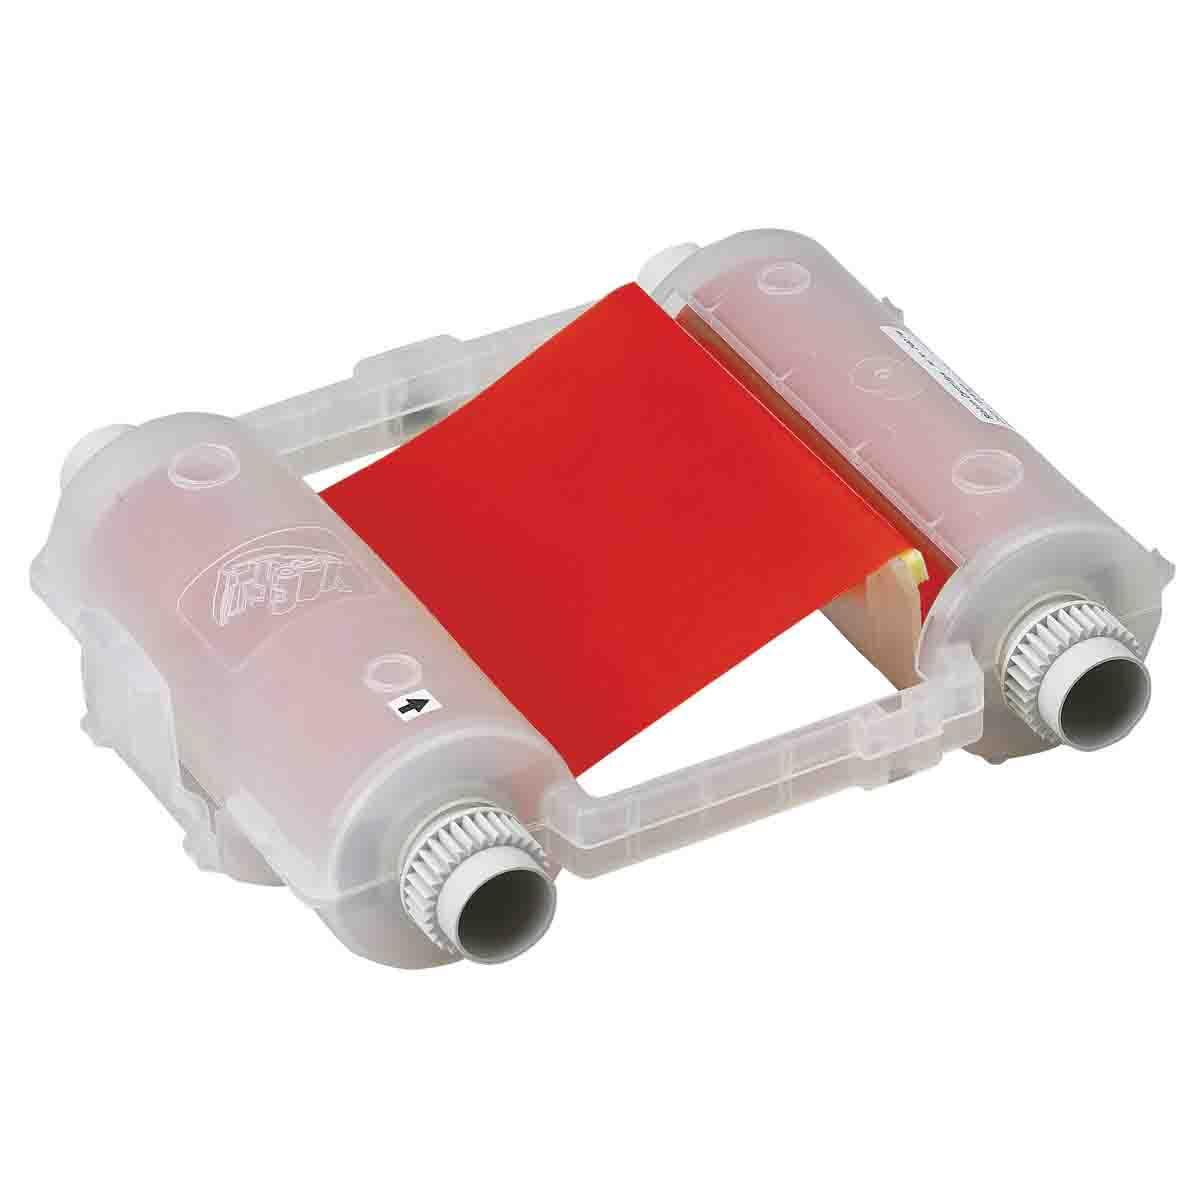 Brady® 76743 R10000 1-Color Industrial Grade Printer Ribbon, 200 ft L x 4.11 in W, Resin, Red